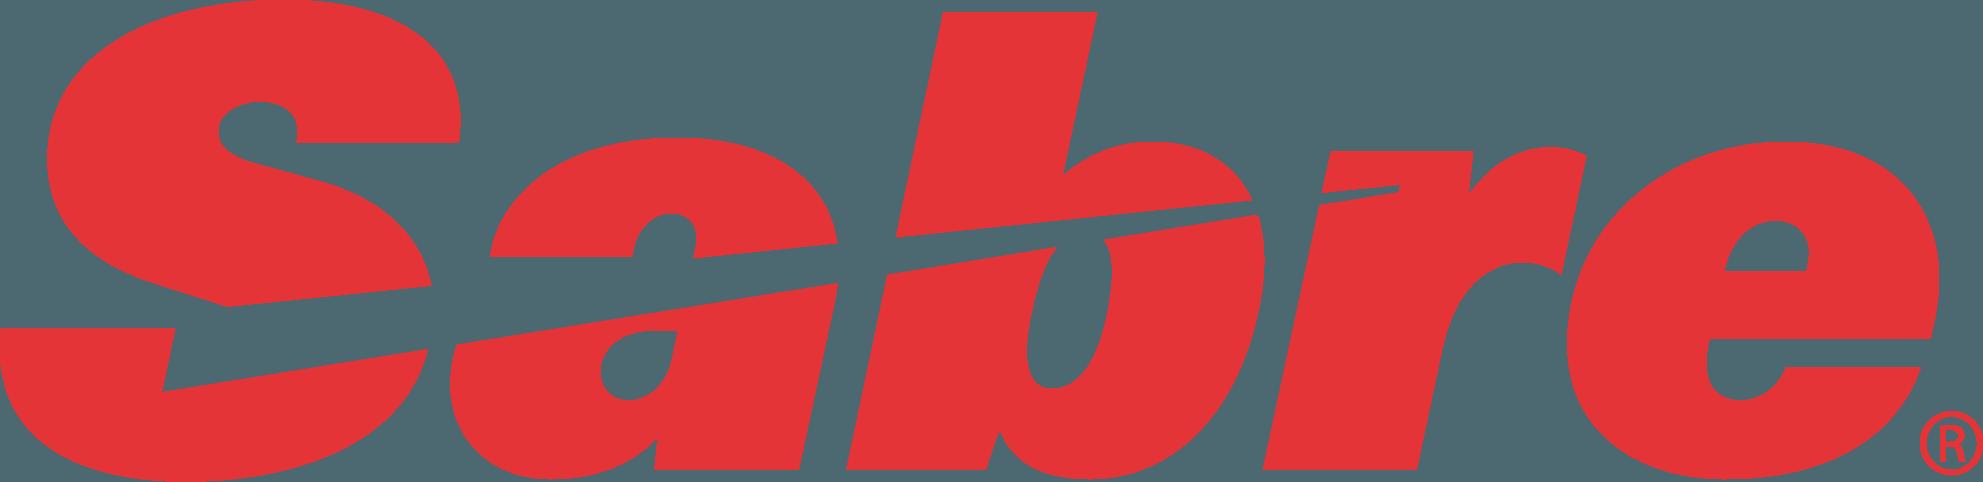 Sabre Logo png